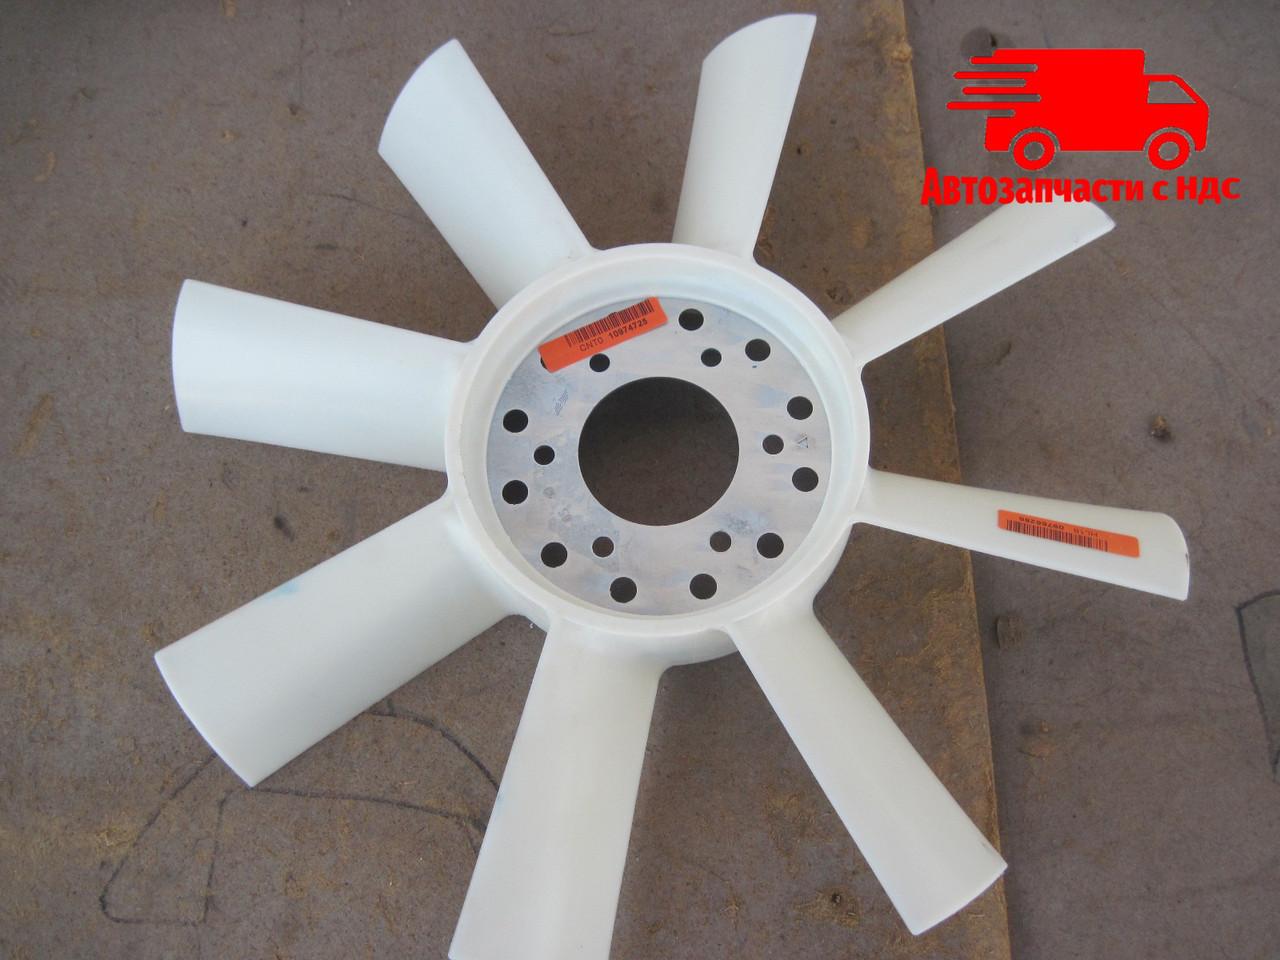 Вентилятор системы охлаждения МТЗ двигатель Д 240, 243, 245 (пр-во Радиоволна). ИЖКС.632558.006 Ціна з ПДВ